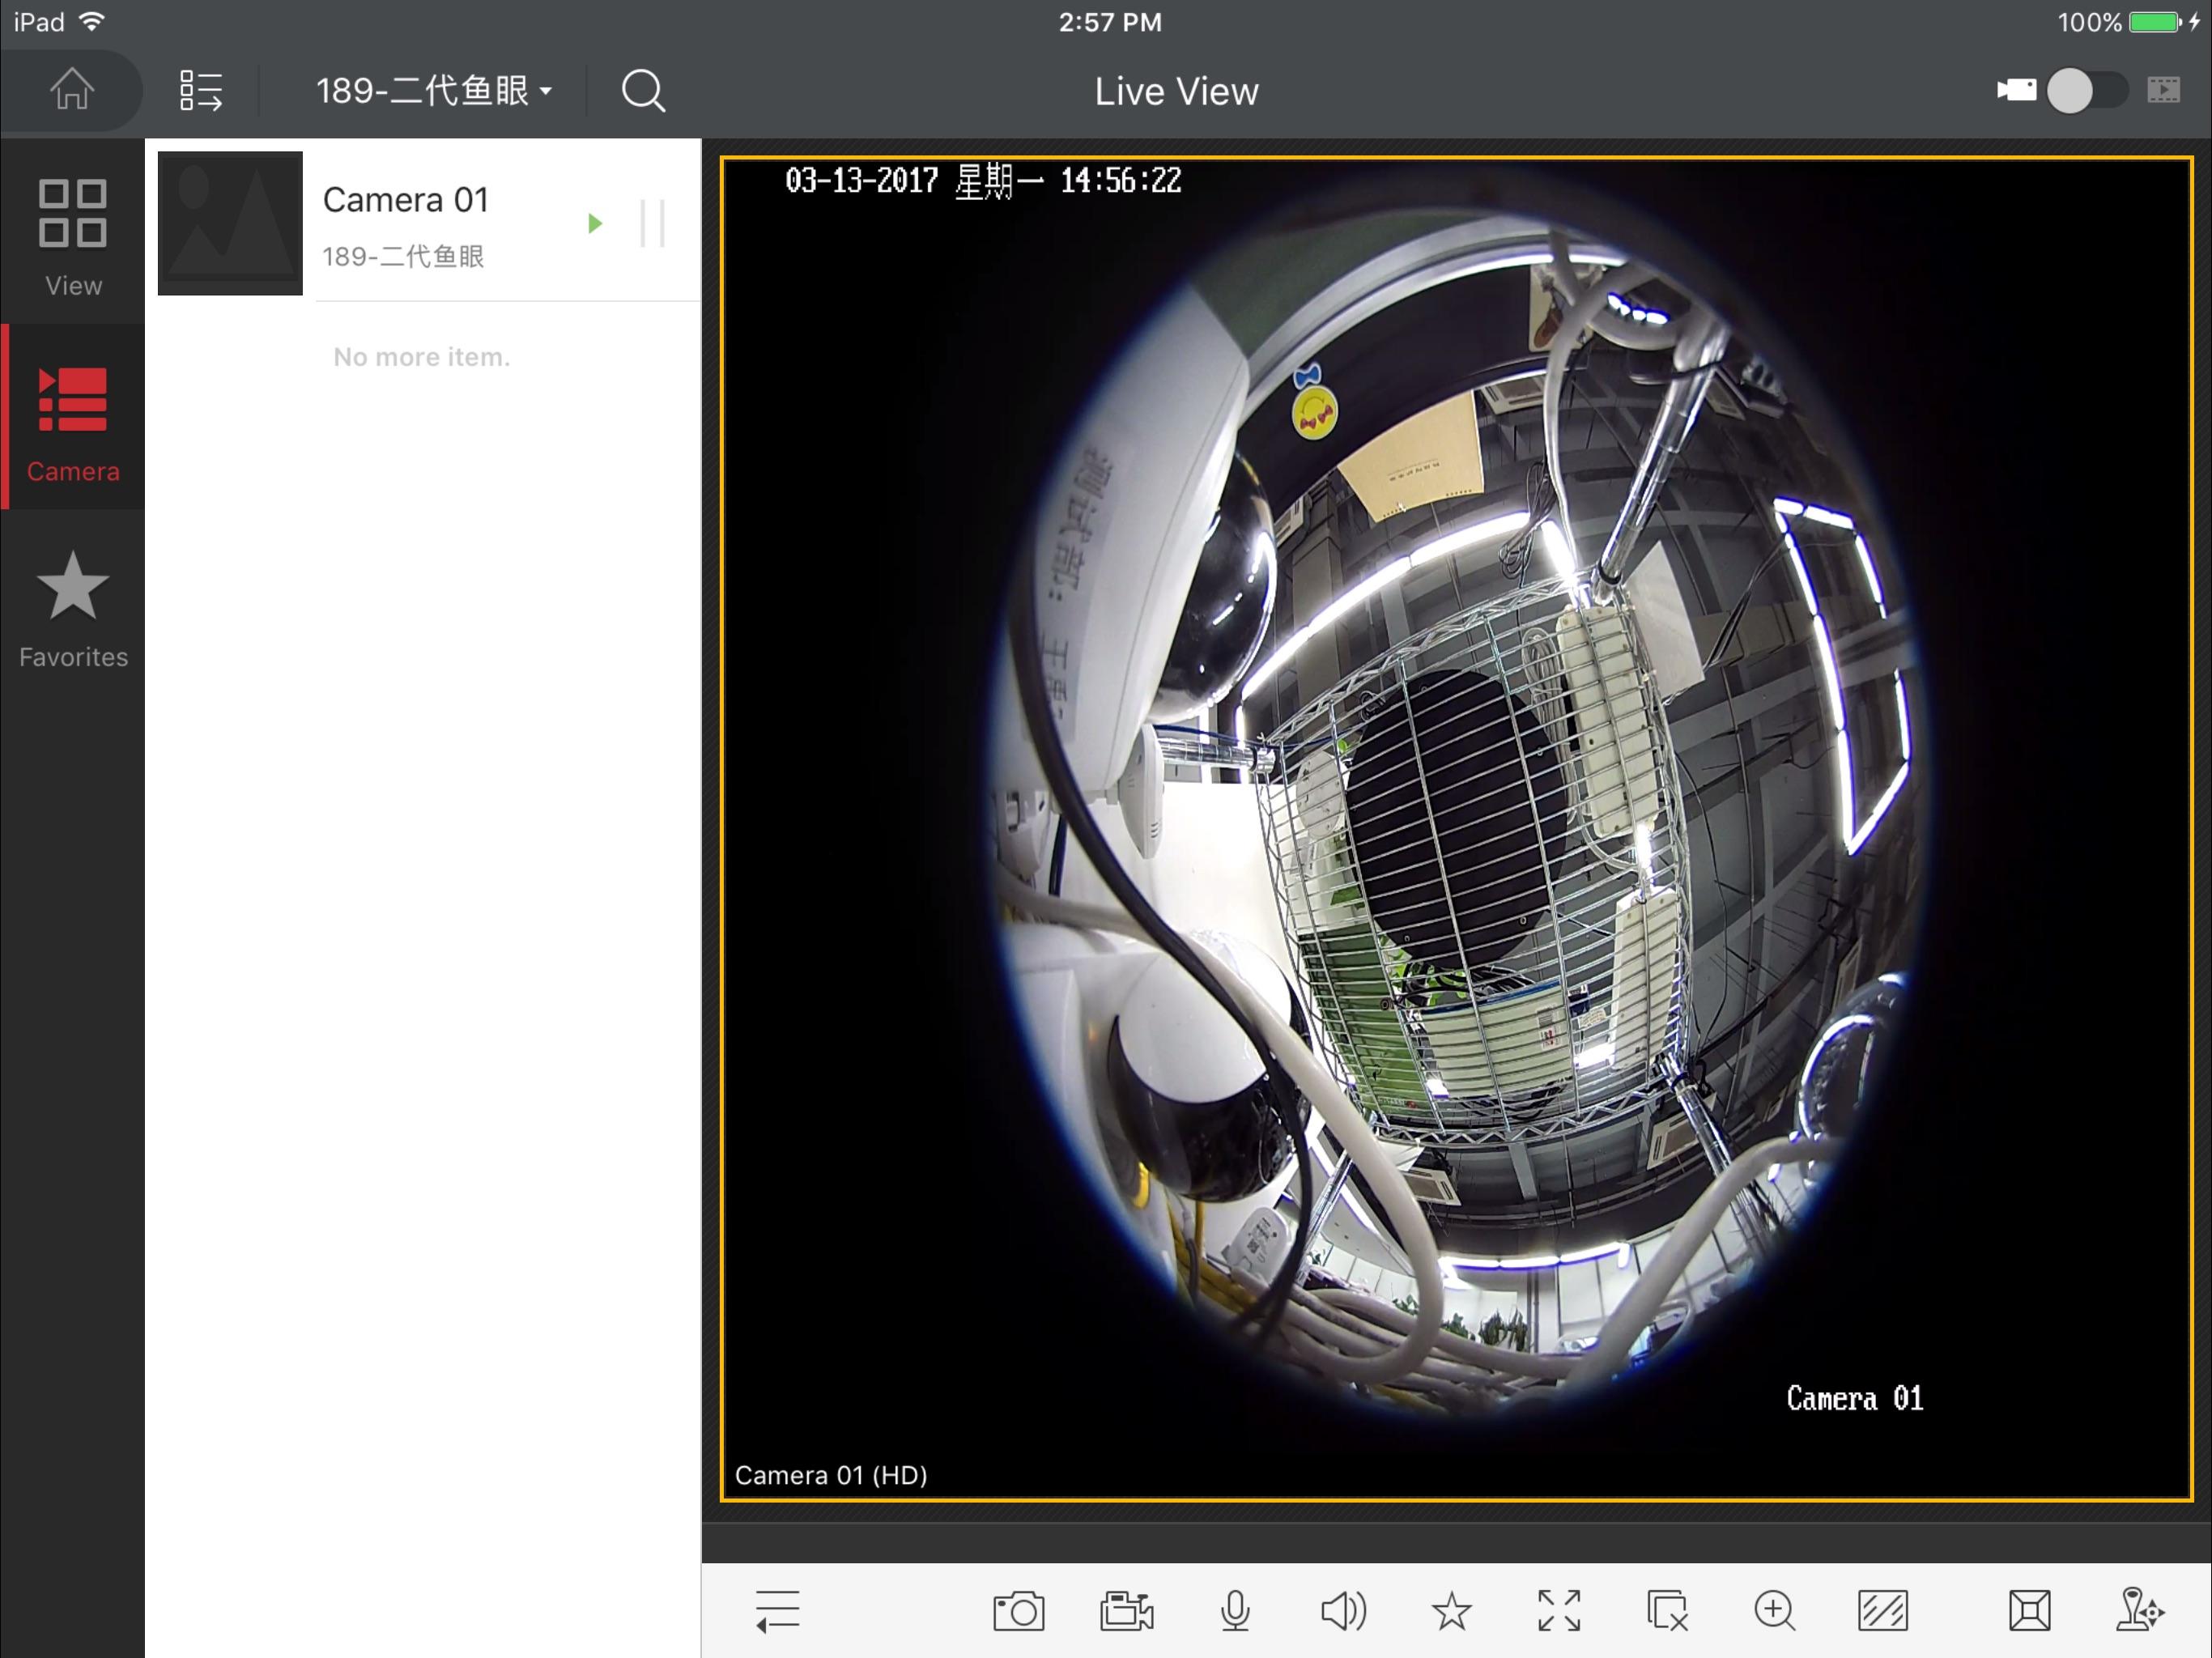 iVMS-5260 HD Screenshot